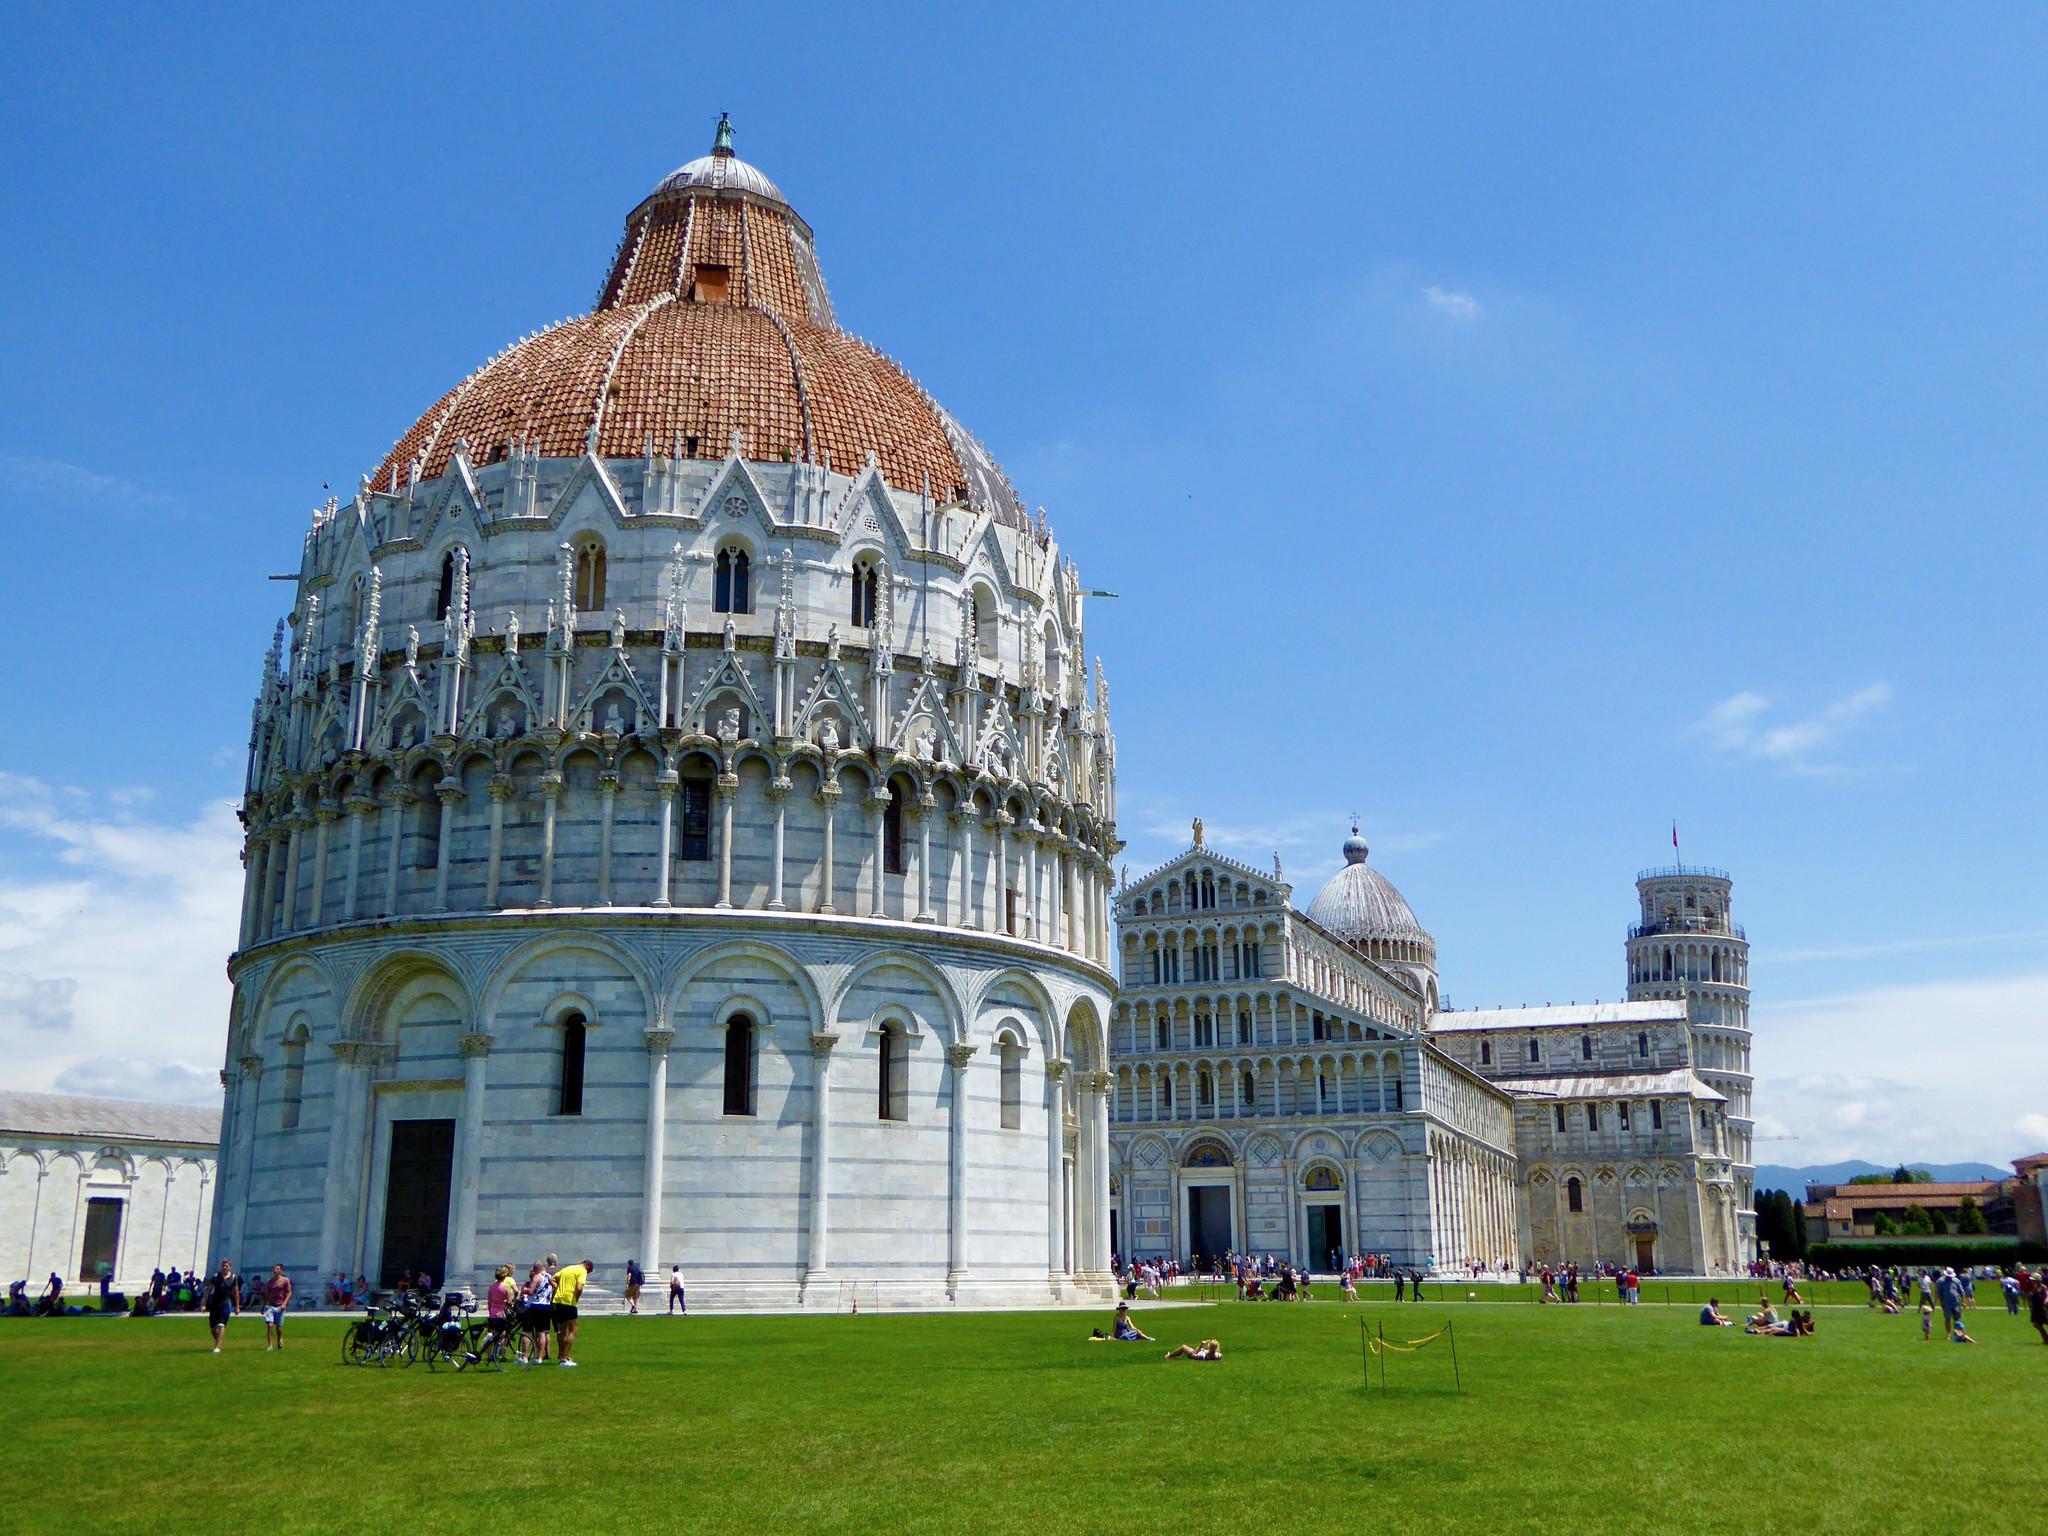 Piazza dei Miracoli - Pisa, Italy [2048x1536]